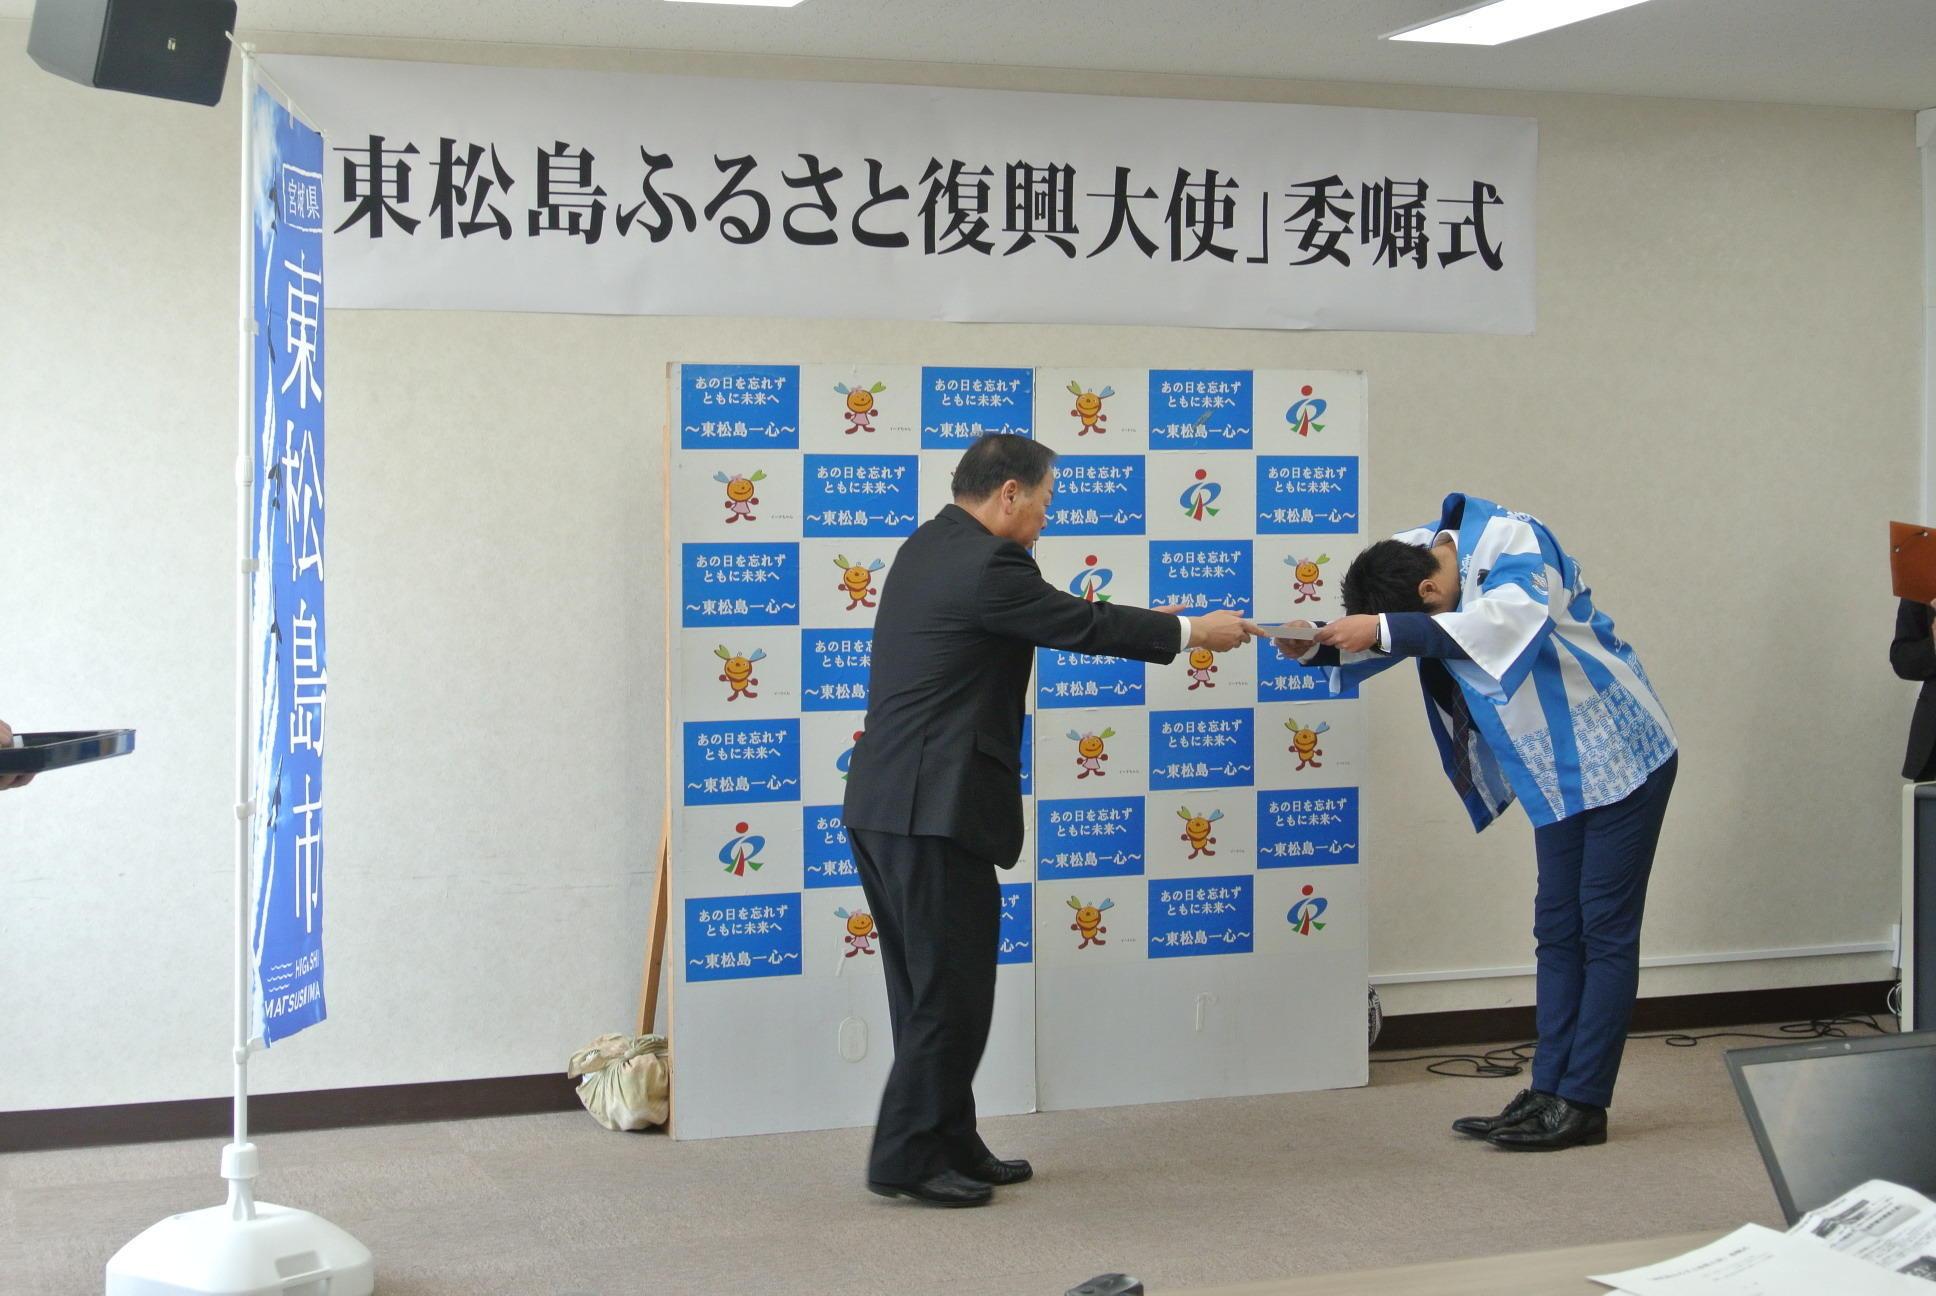 http://news.yoshimoto.co.jp/20170410145344-4f5fa9c2645d25193c55dcd66f72687c57b86288.jpg